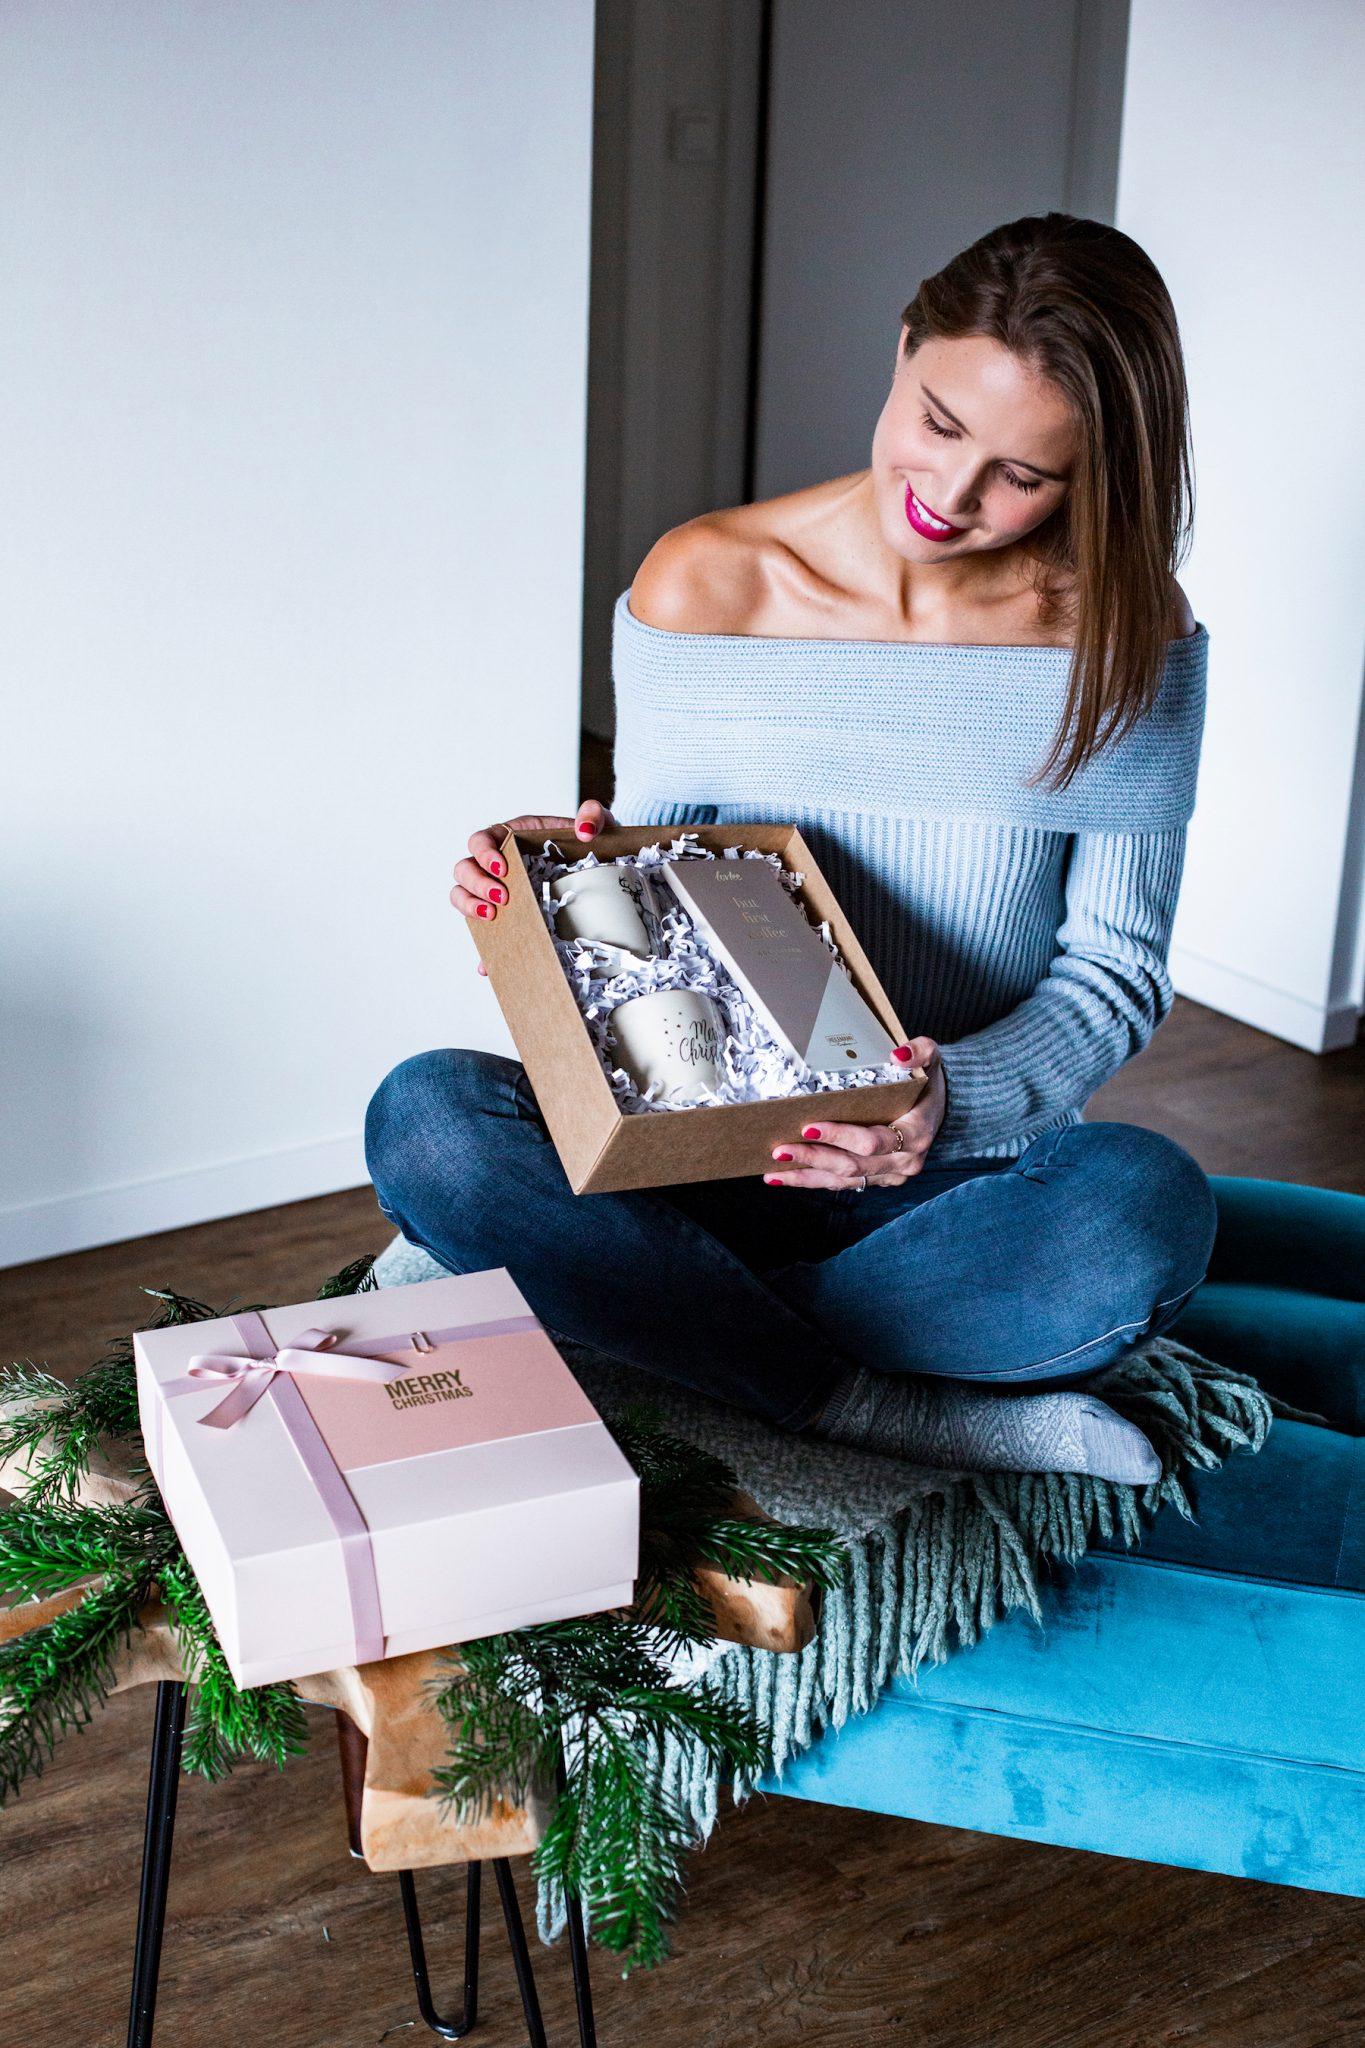 suelovesnyc_gewinnspiel_weihnachten_geschenkboxen_lovlee_2